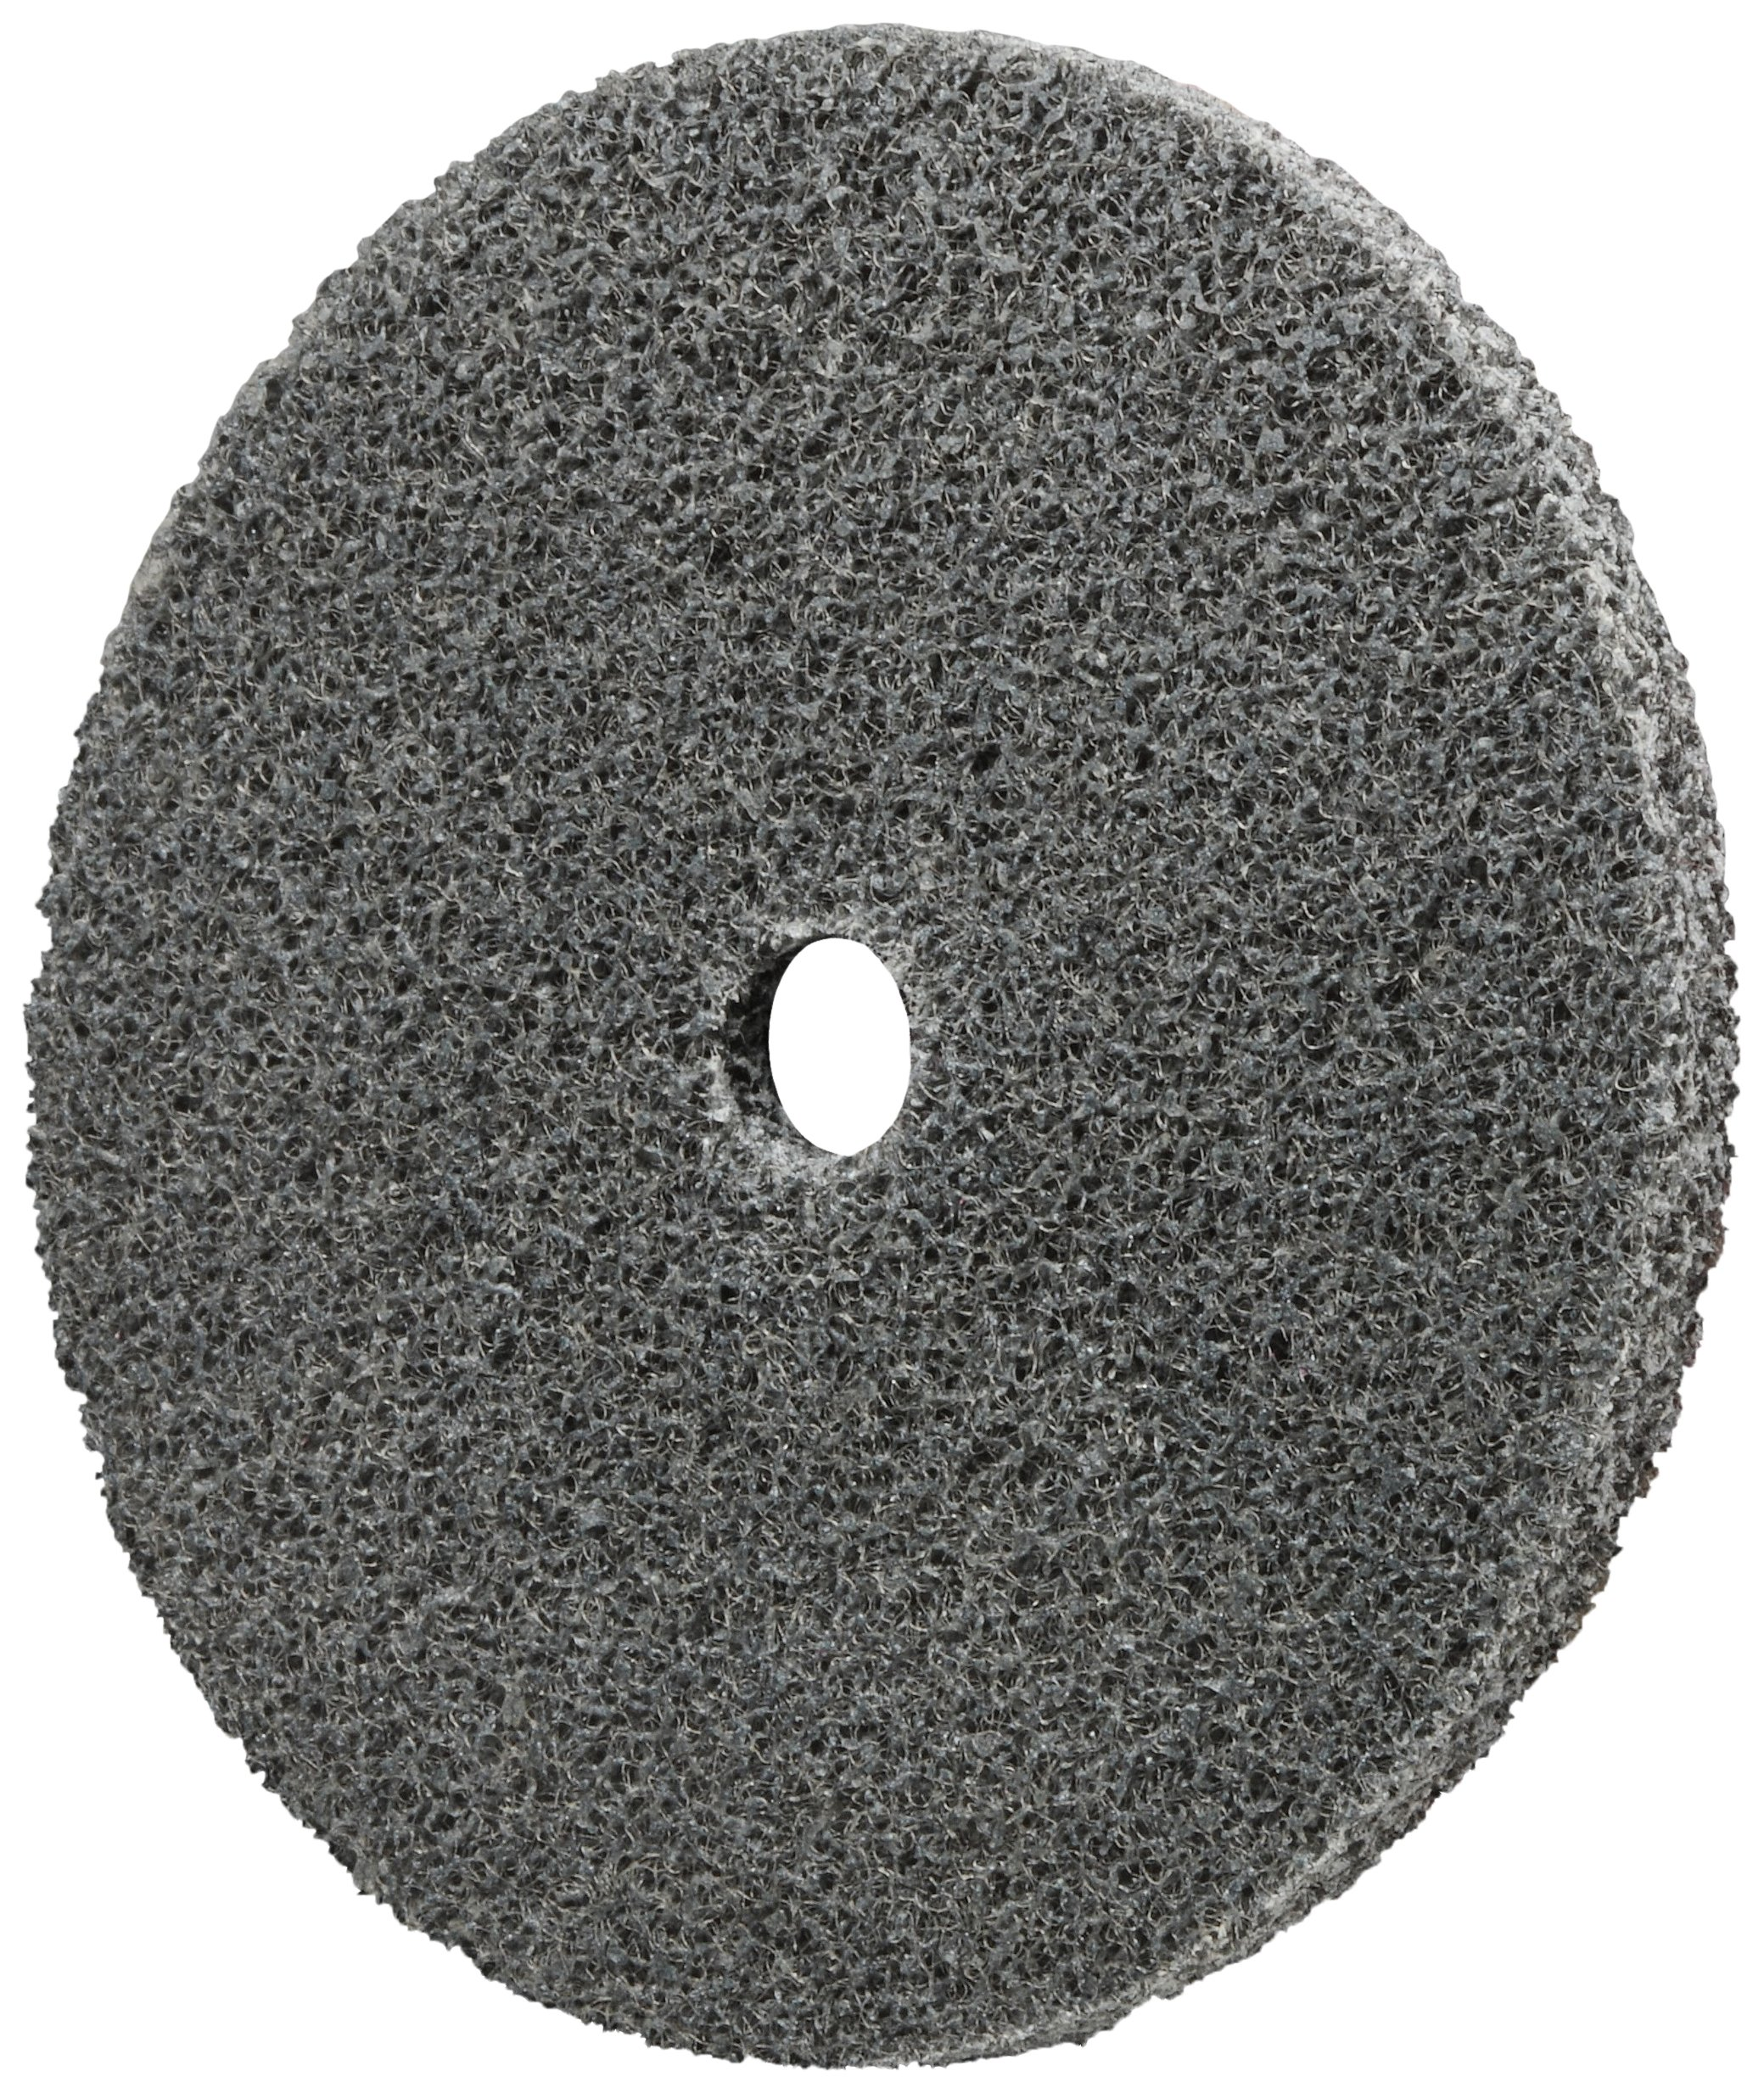 Scotch-Brite 15533 EXL Unitized Wheel, 3'' x 3/4'' x 1/4'' 2A MED, 3'' Diameter, Abrasive Grit, 9000 rpm